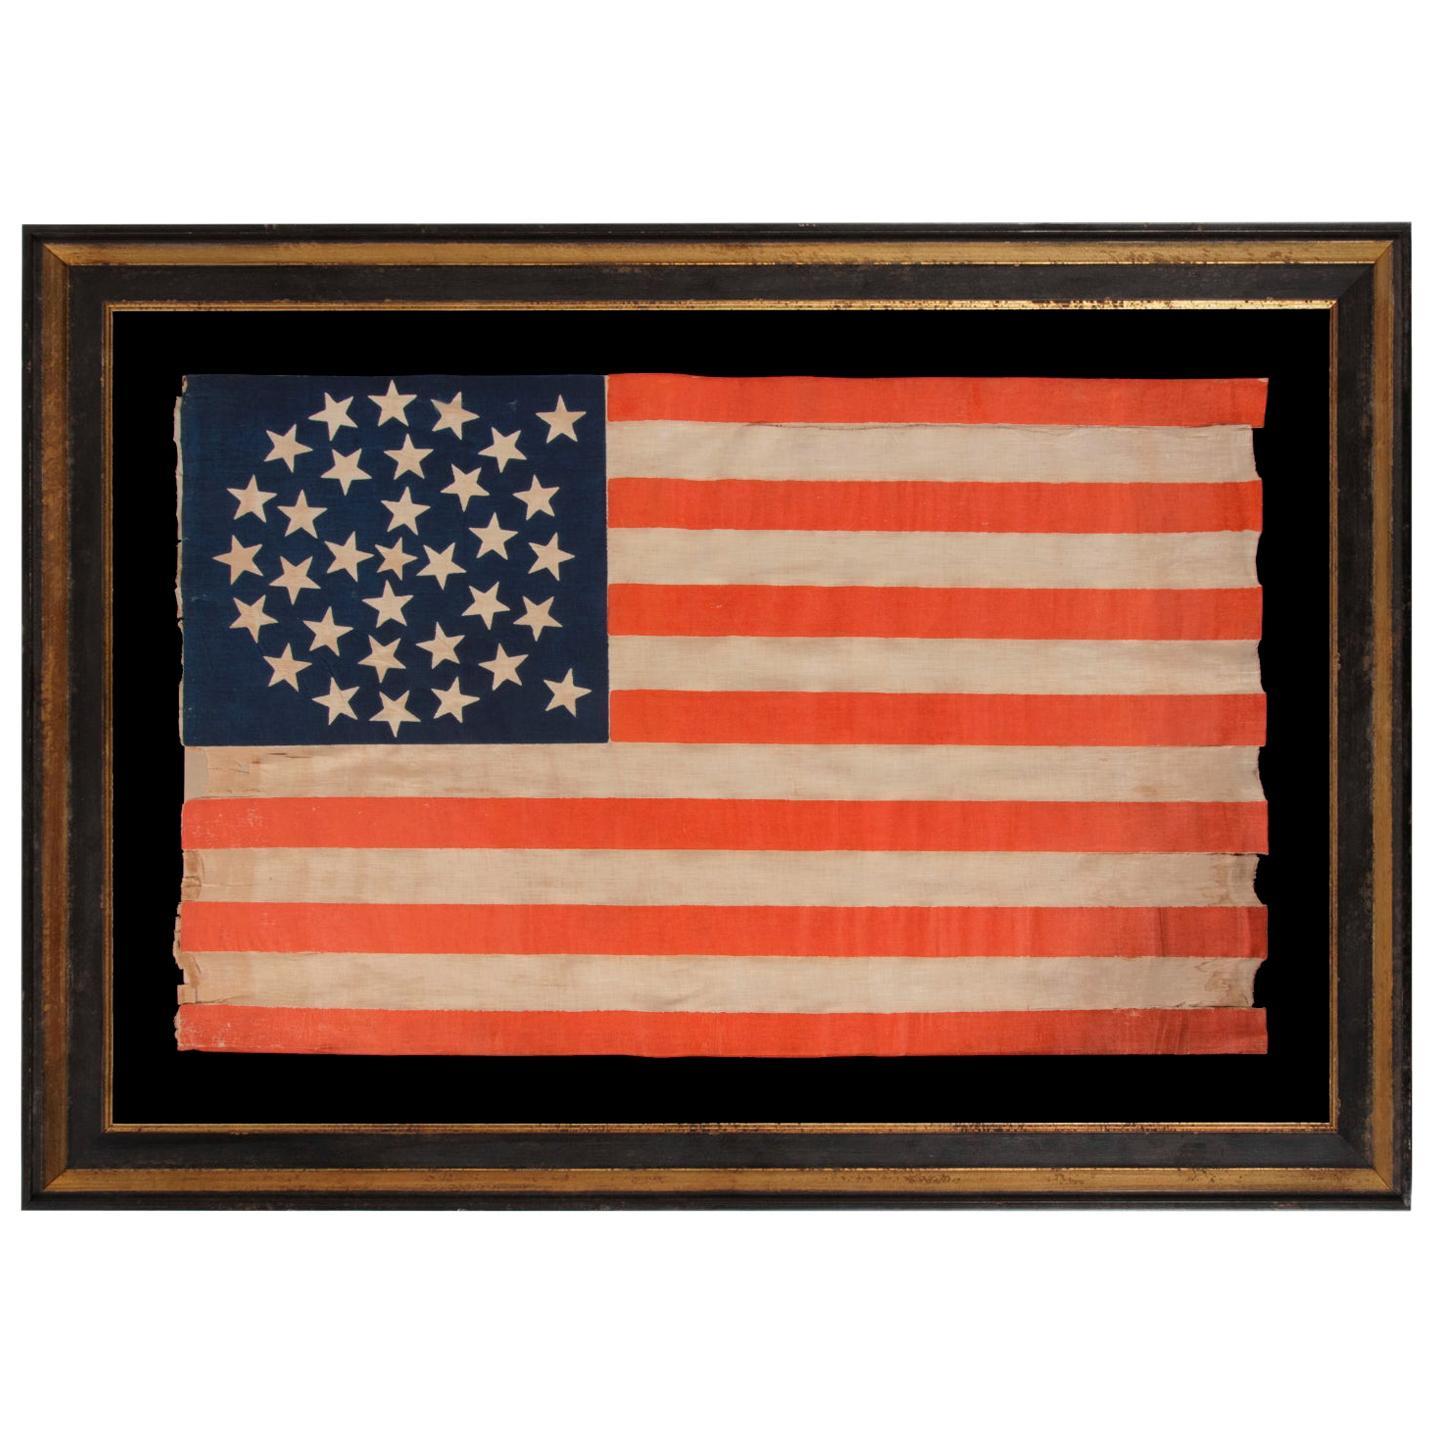 33 Star Antique American Flag, Medallion Configuration, Oregon Statehood 1859-61